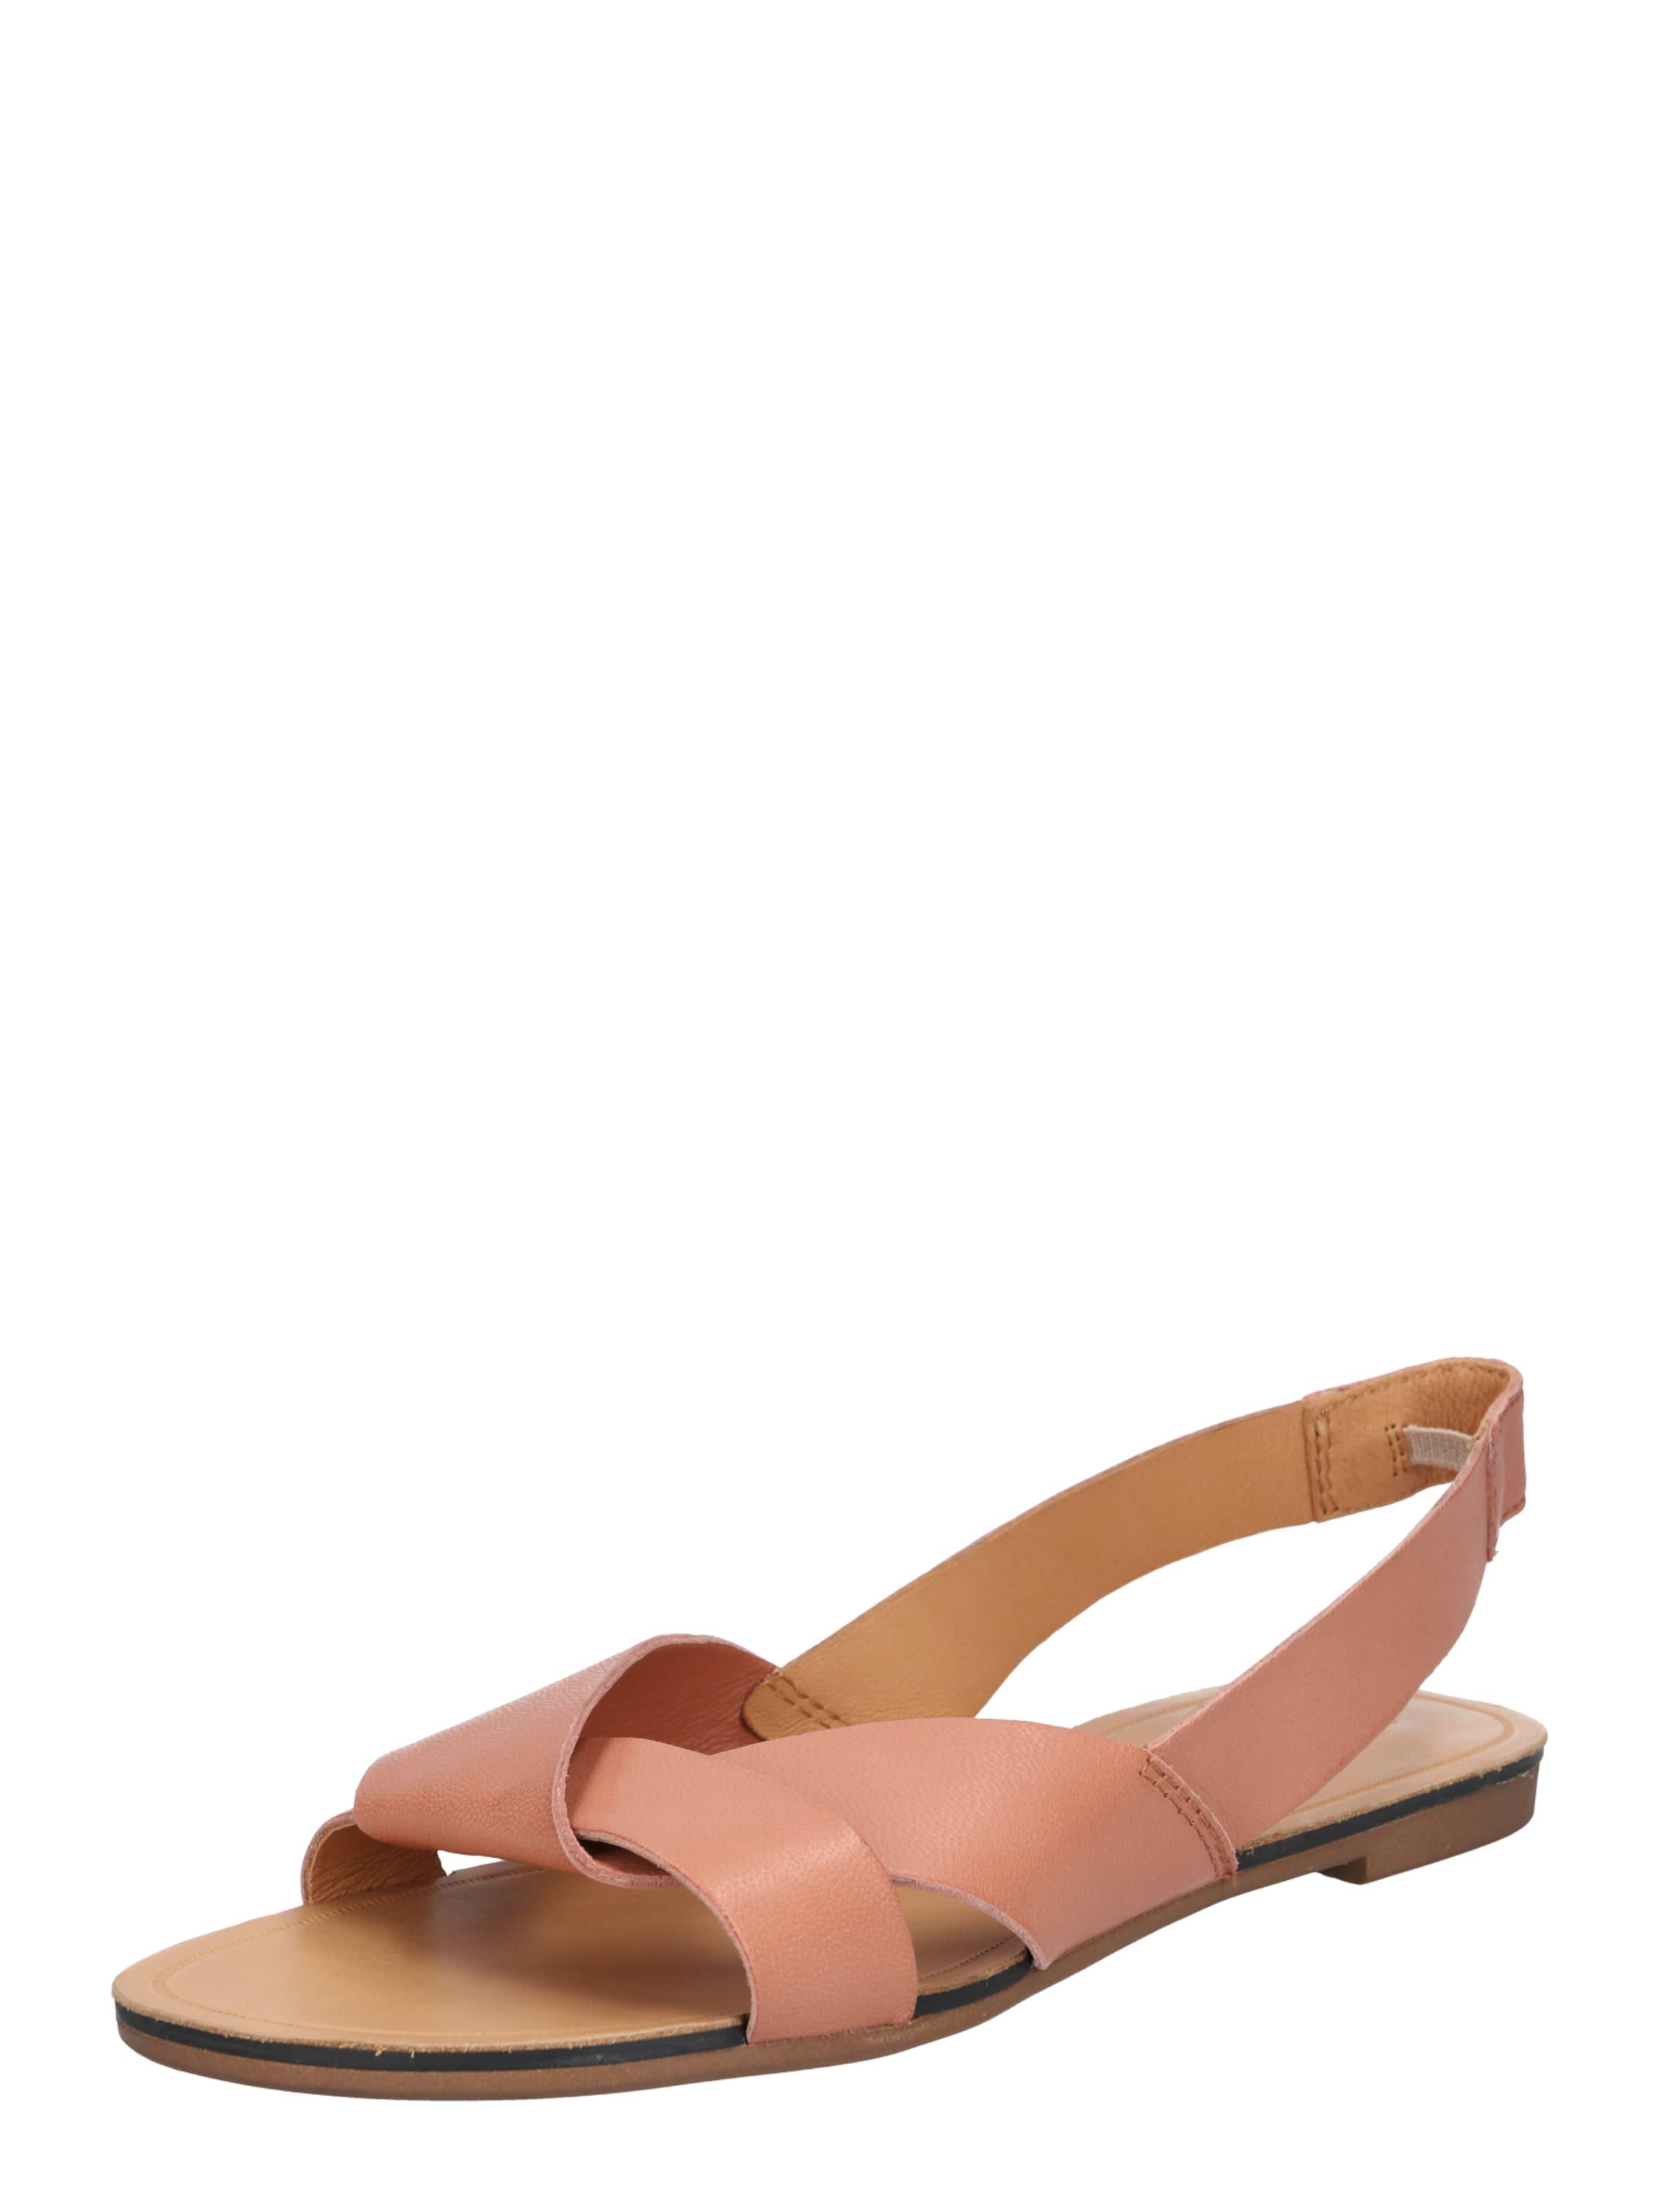 Vagabond Vagabond In Vagabond In Rosa Rosa Shoemakers Sandalen Shoemakers Sandalen zMqSUVp